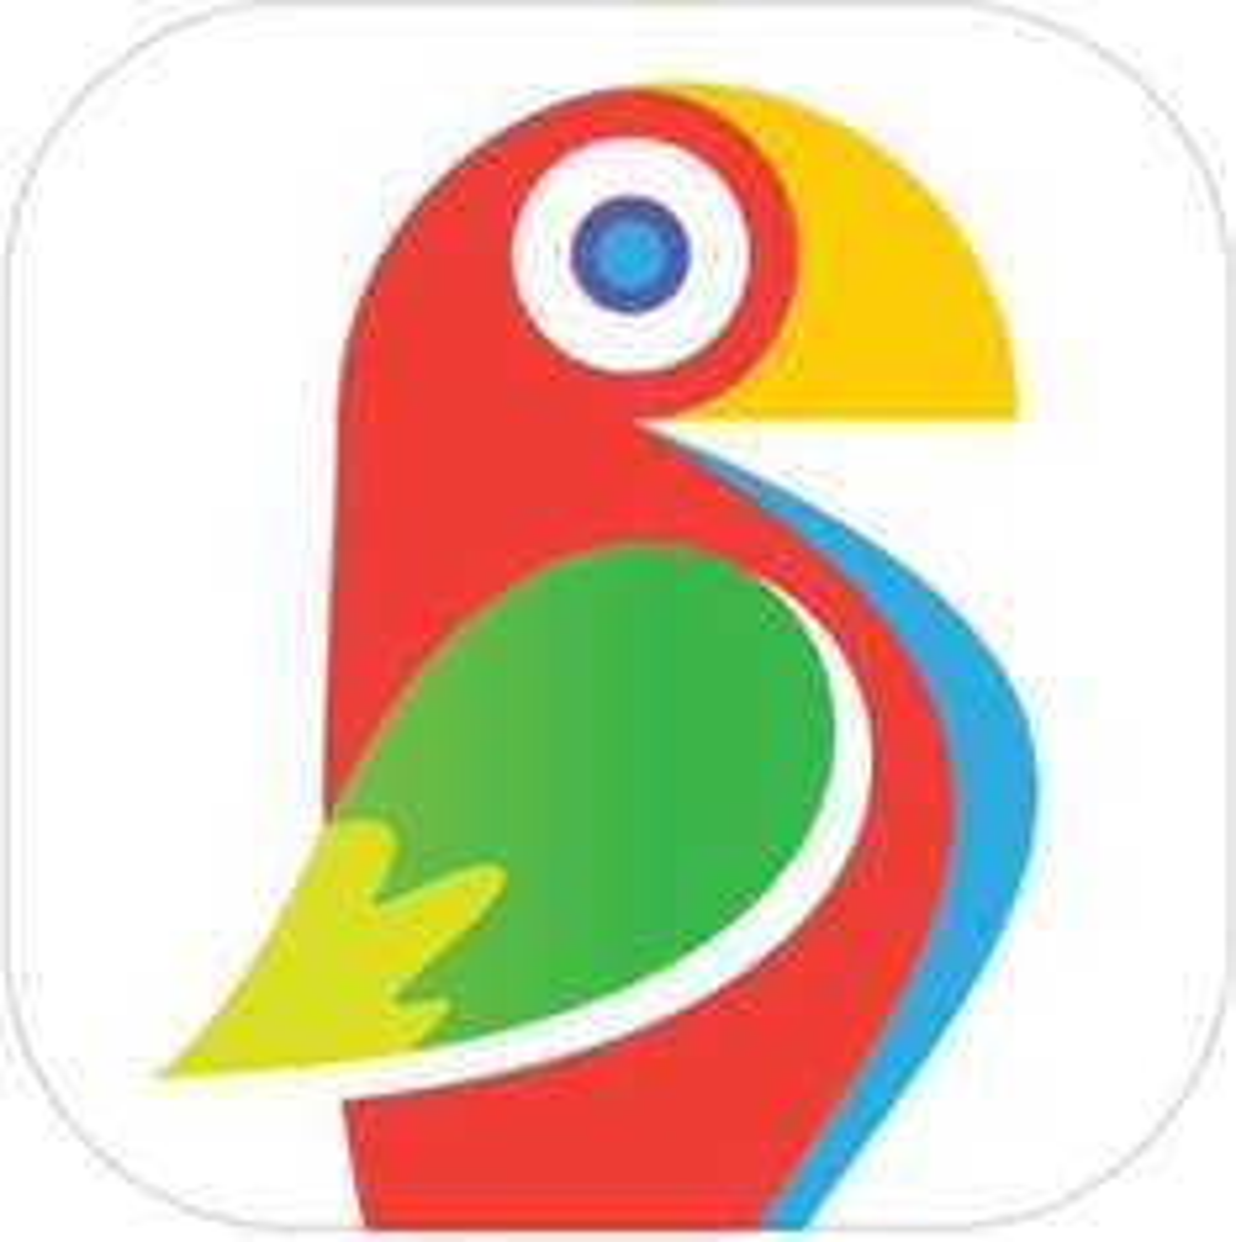 [iOS] Brushstroke Bildbearbeitung kostenlos statt 4,99€